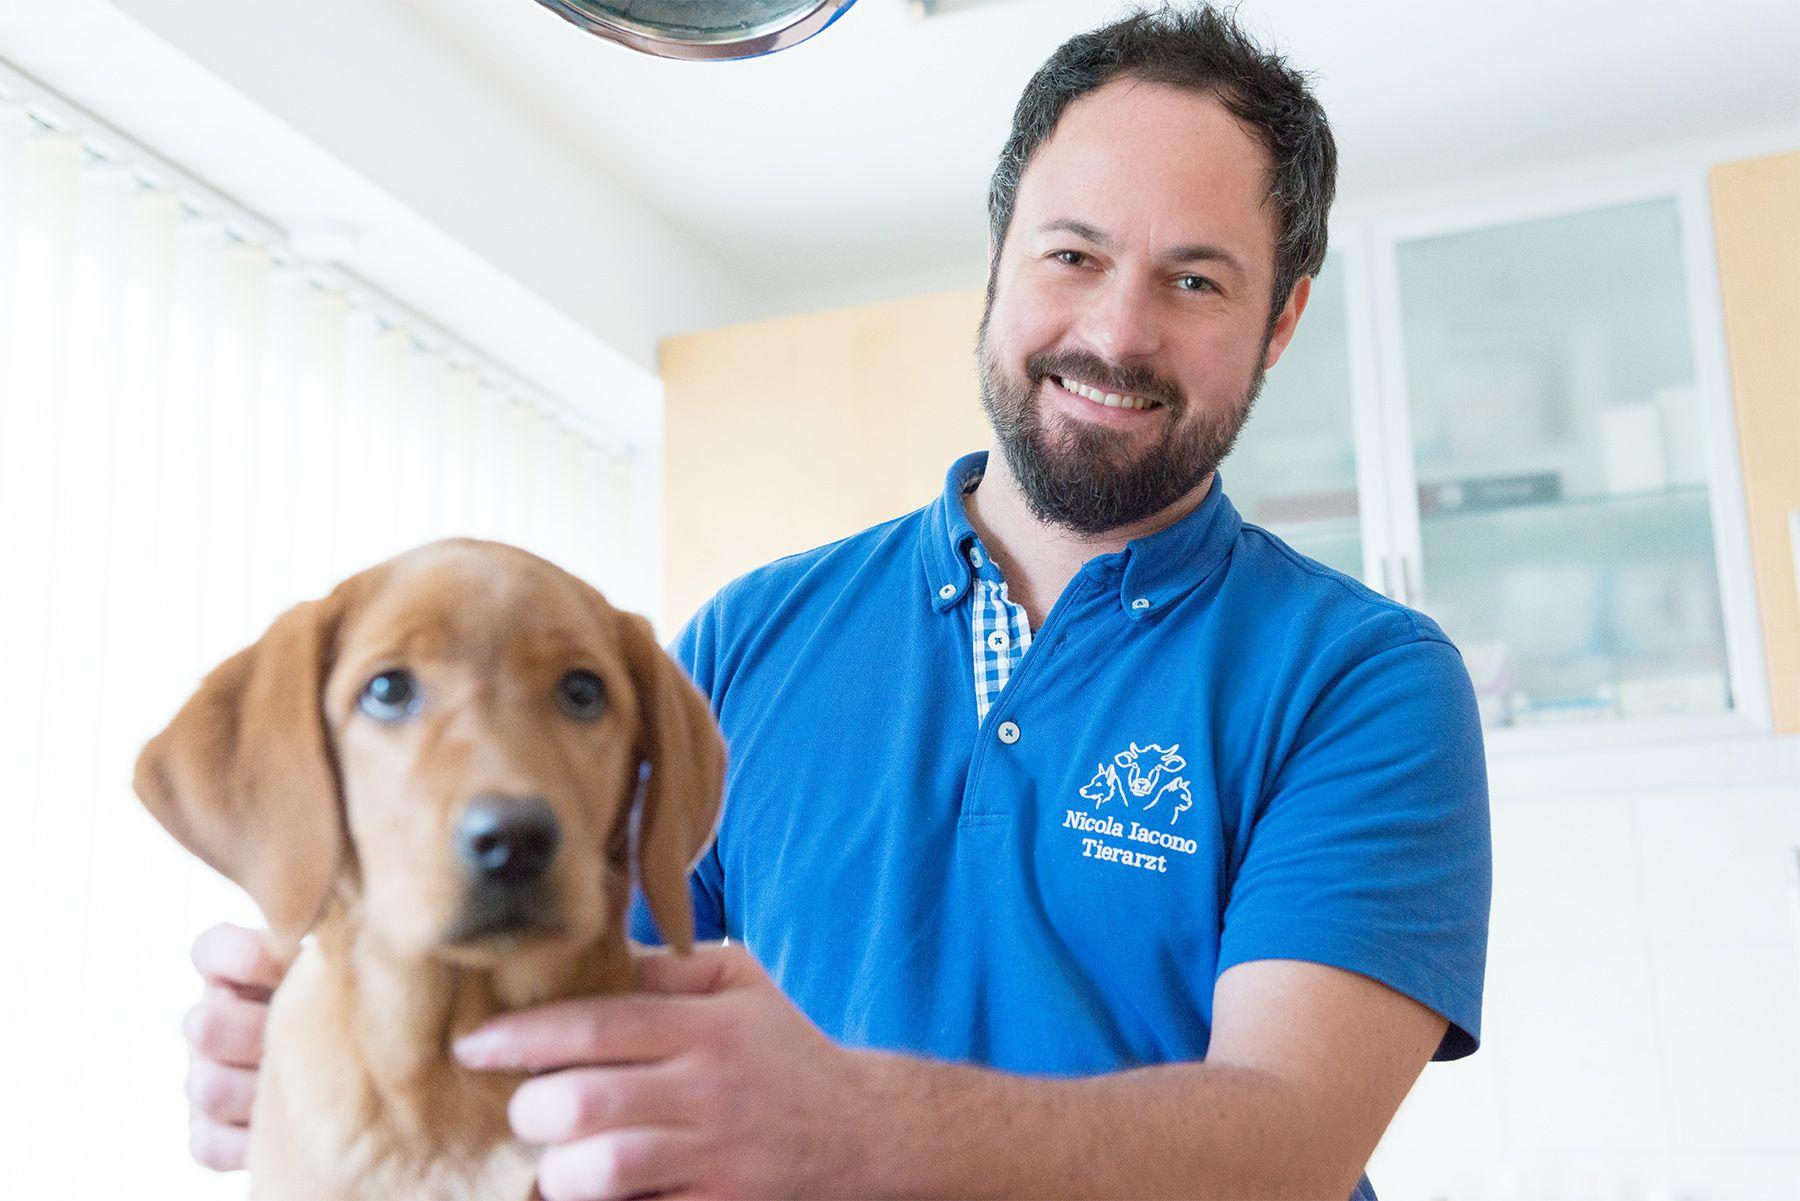 Tierarzt Regensburg Notdienst